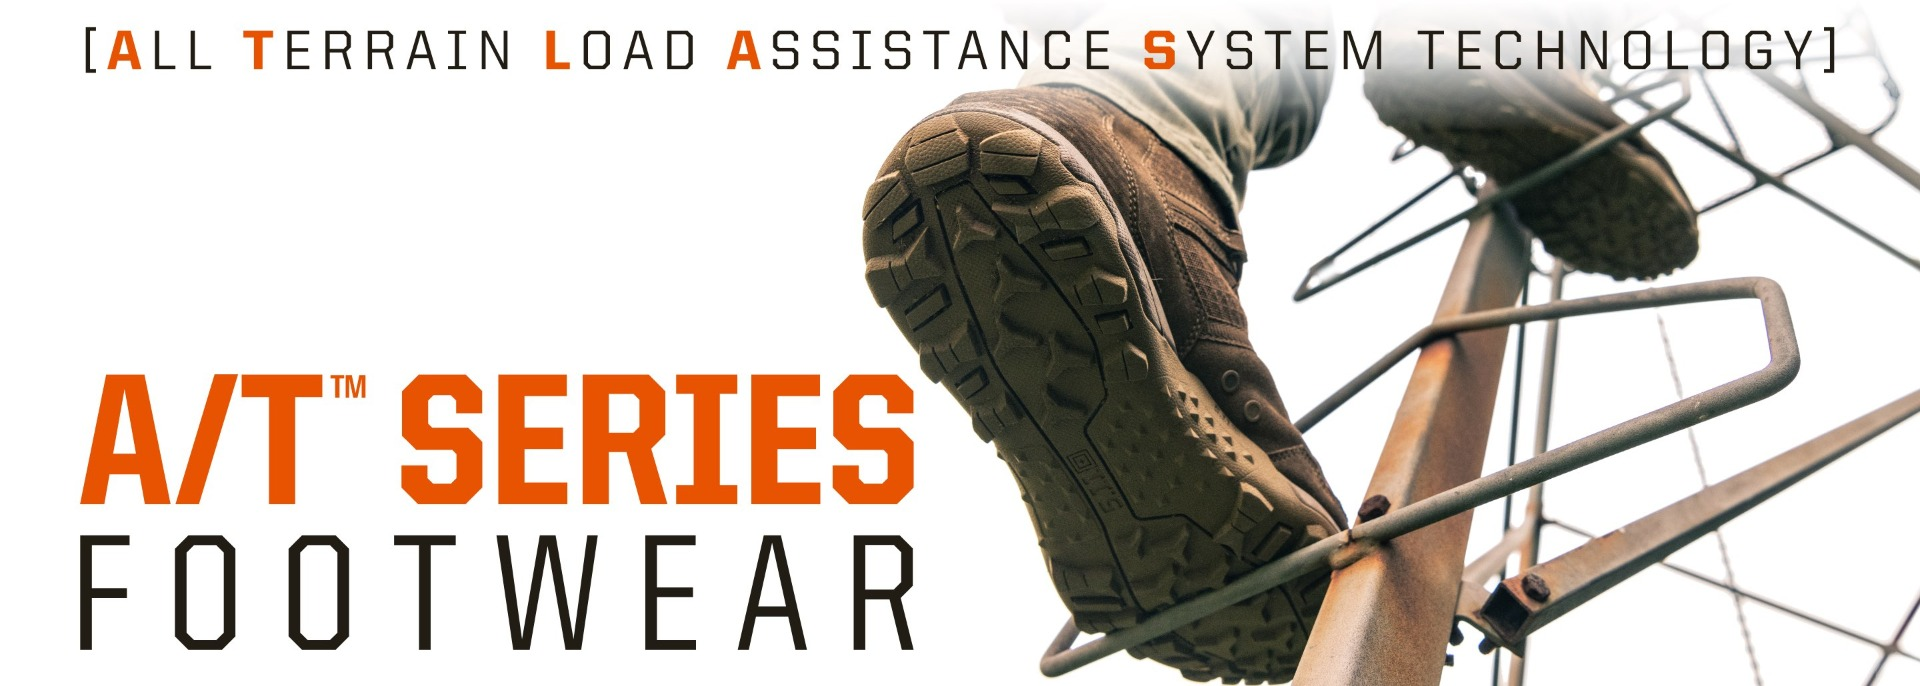 5.11 A/T Series Footwear